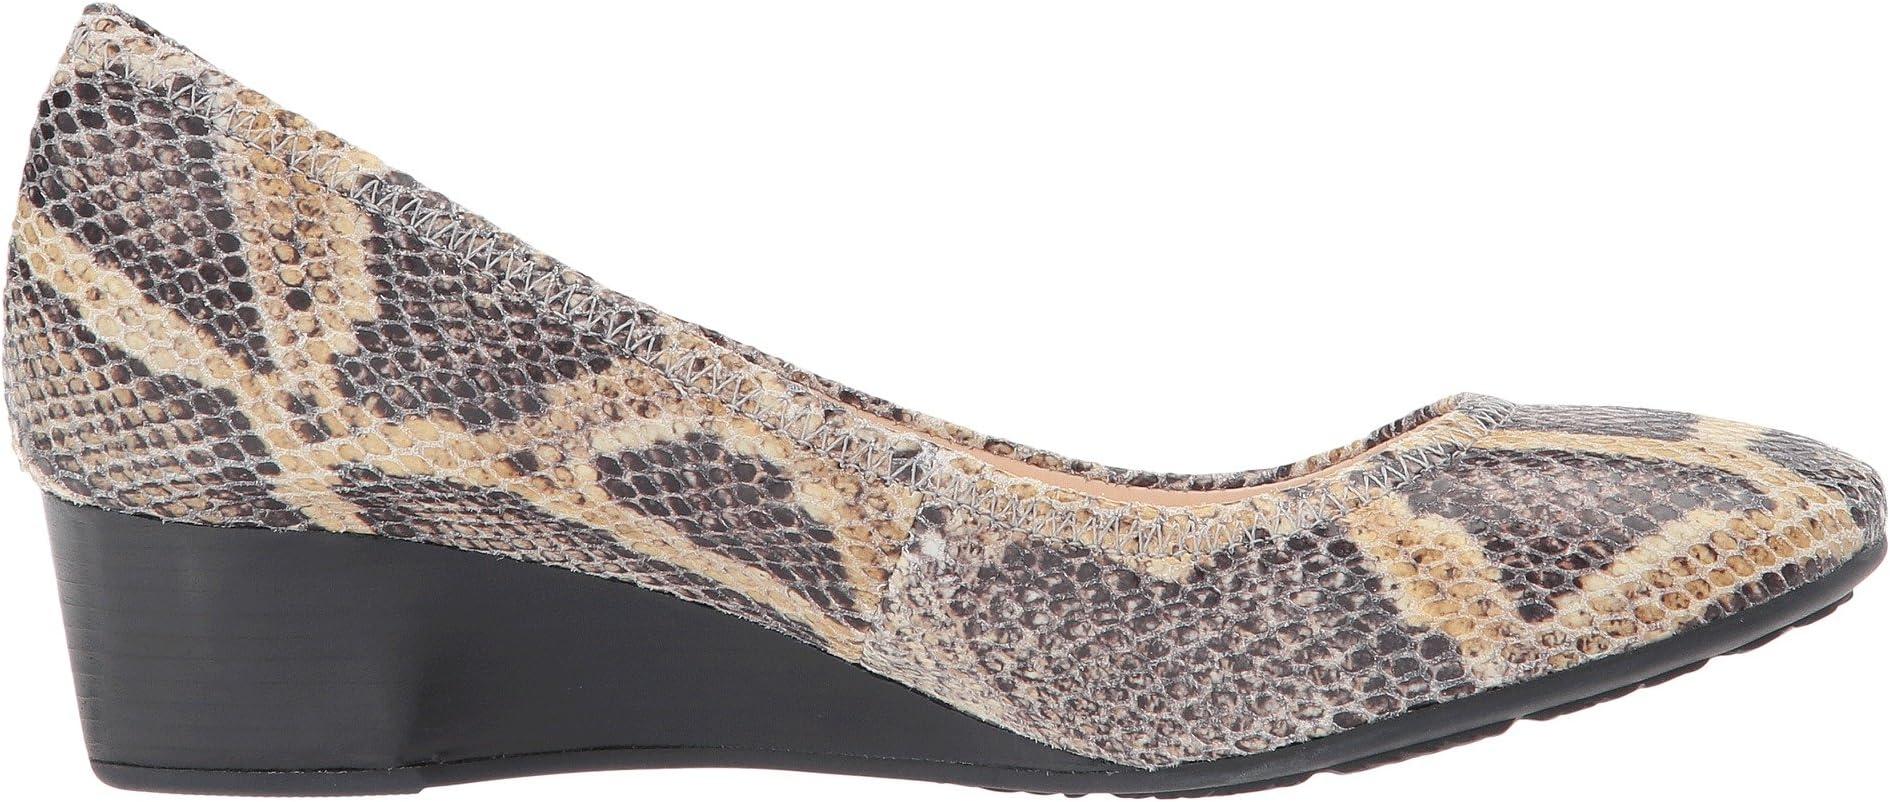 Cole Haan Sadie Wedge 40mm | Women's shoes | 2020 Newest